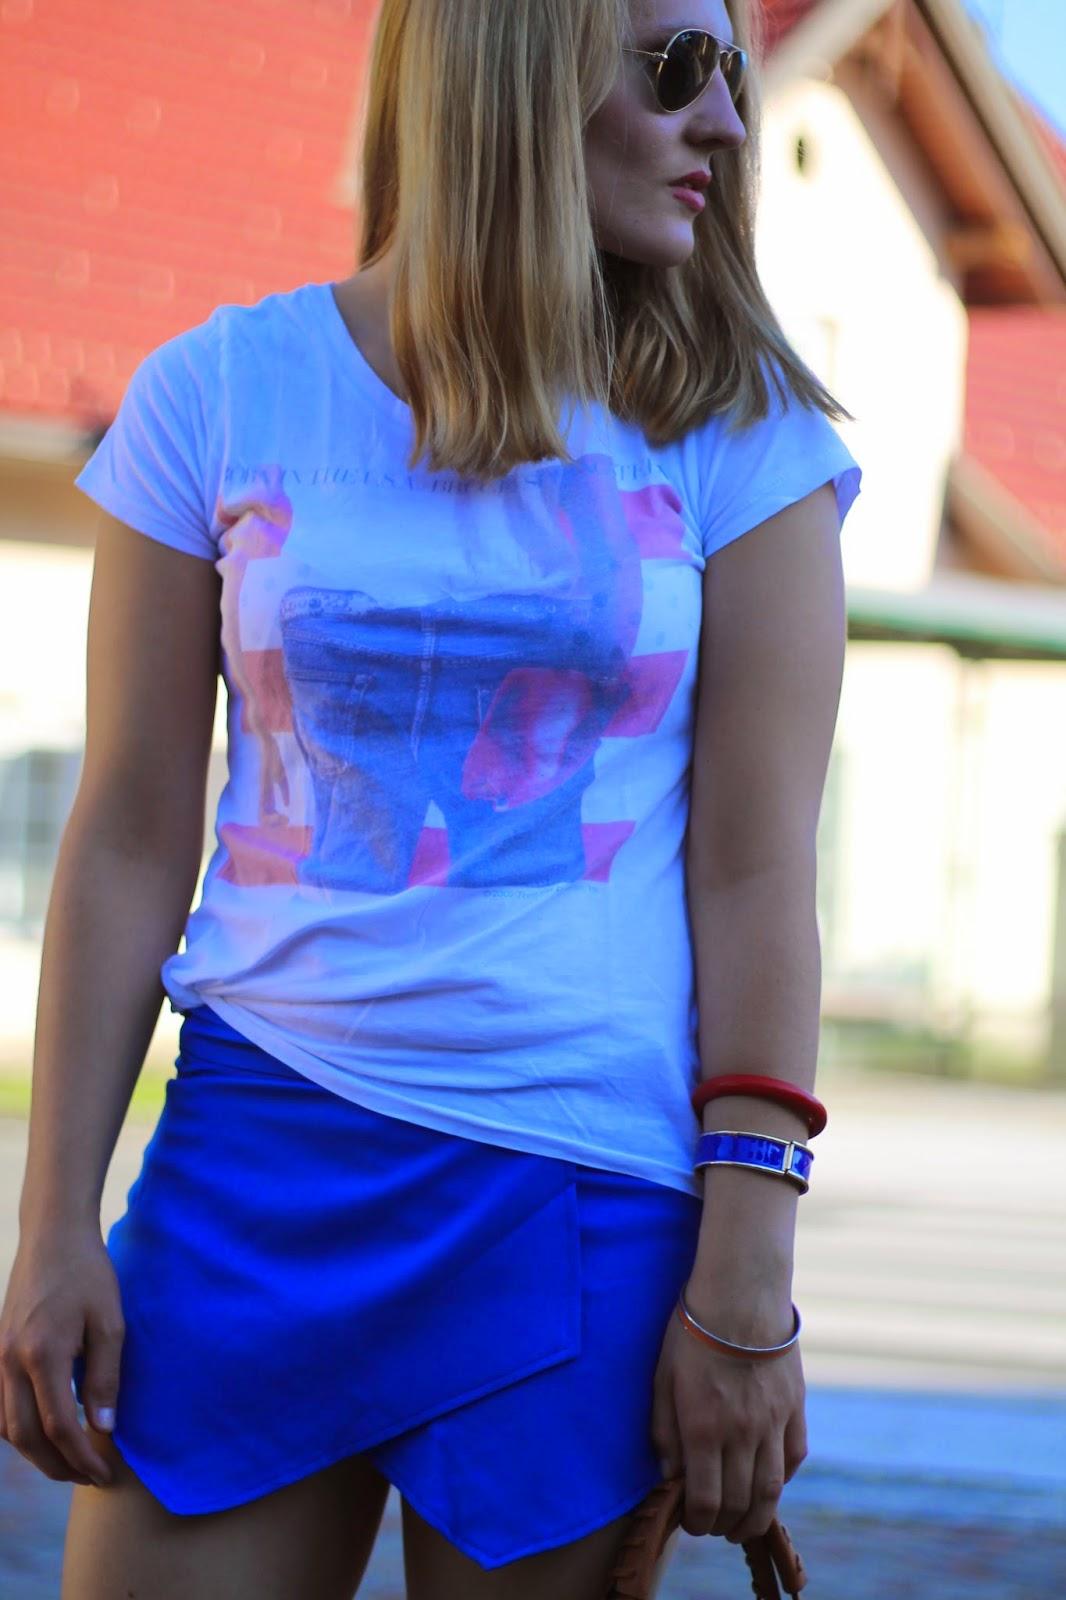 Fashionblogger Austria / Österreich / Deutsch / German / Kärnten / Carinthia / Klagenfurt / Köttmannsdorf / Spring Look / Classy / Edgy / Summer / Summer Style 2014 / Summer Look / Fashionista Look /   / Summer Look / Oasap / H&M / Zalando / Even and Odd / Forever 21 / Vero Moda / RAy Ban Aviator Sunglasses / Bruce Springsteen / Skorts / Band Shirt / Rockstar Shirt /